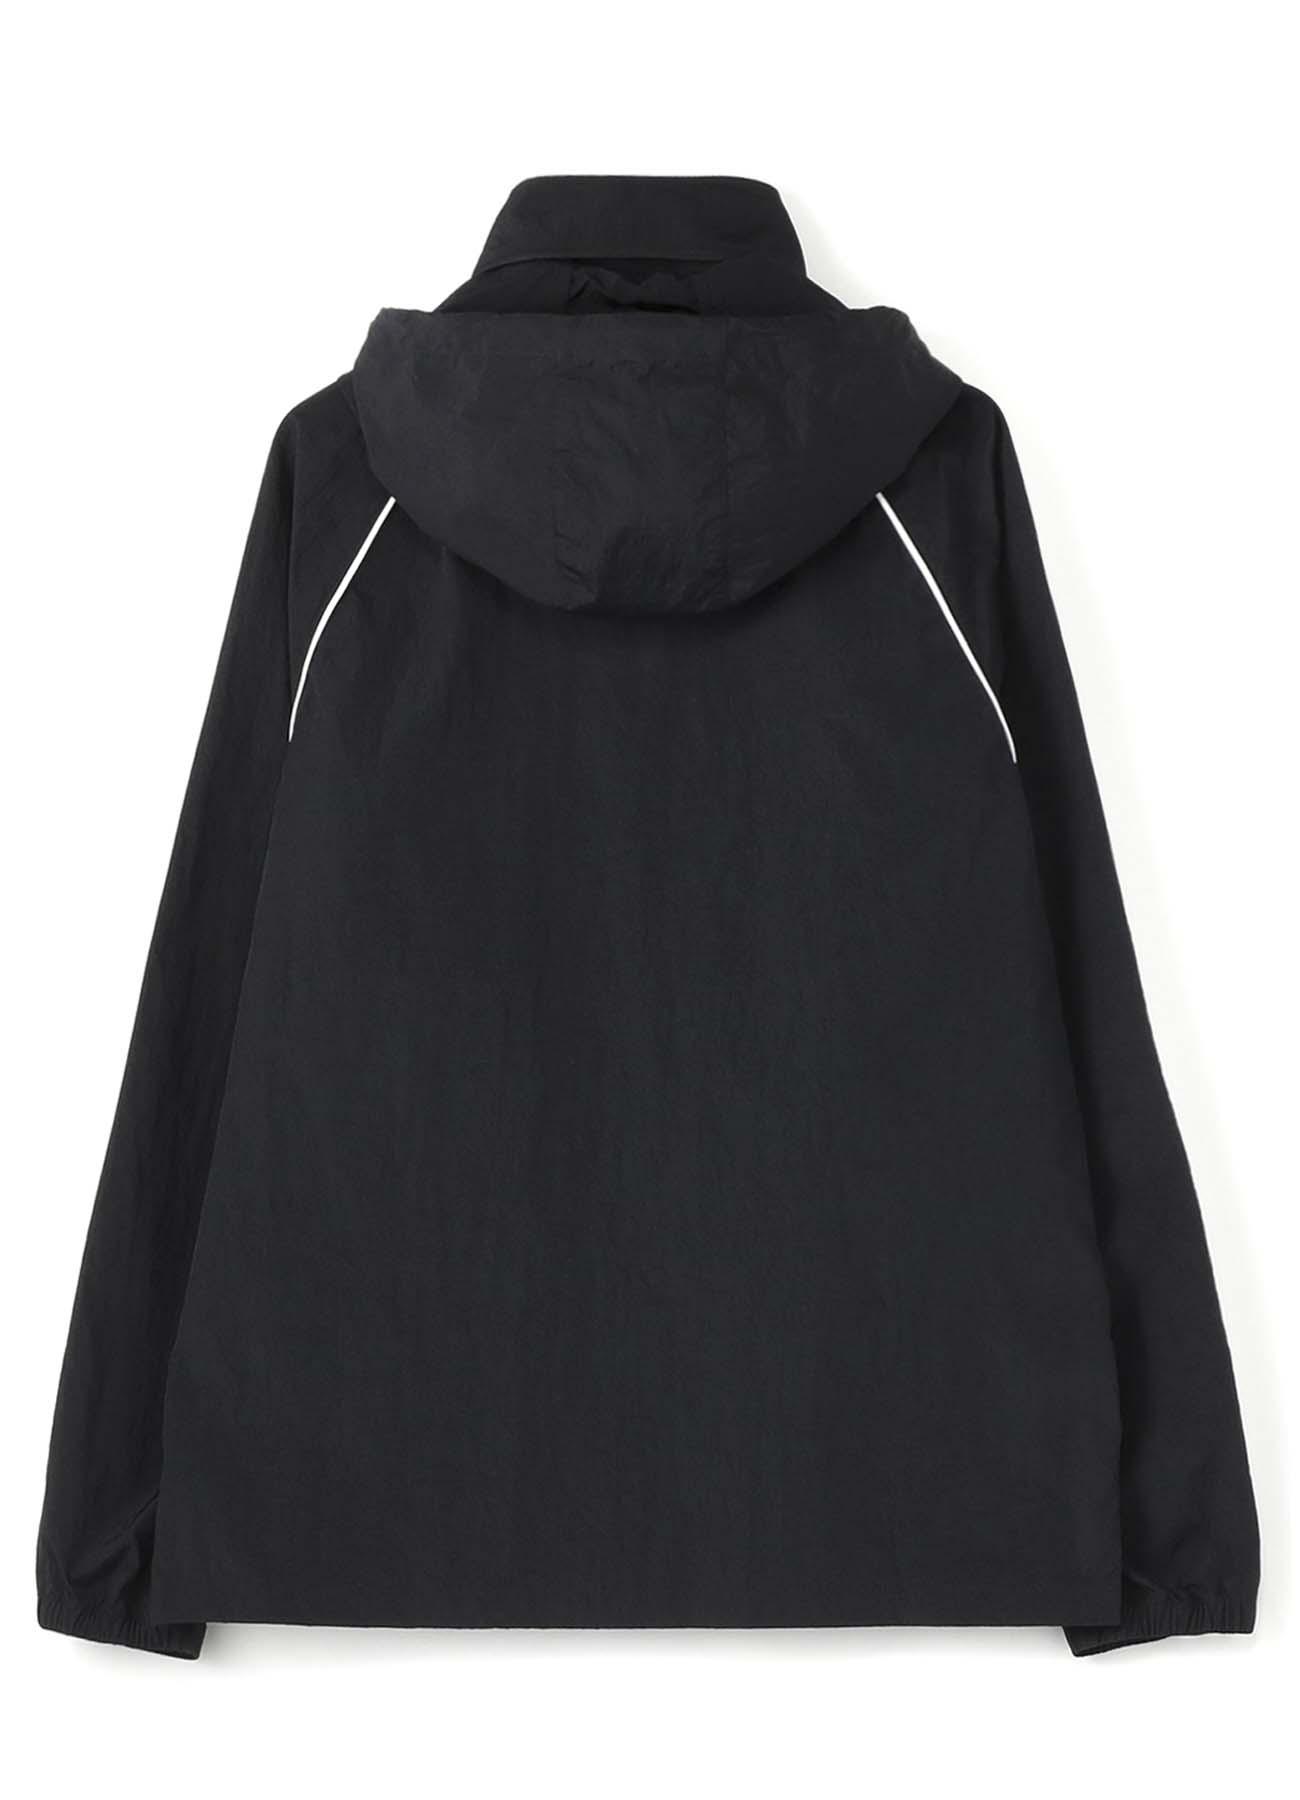 Yohji Yamamoto × adidas YY WINDBREAKER BLACK